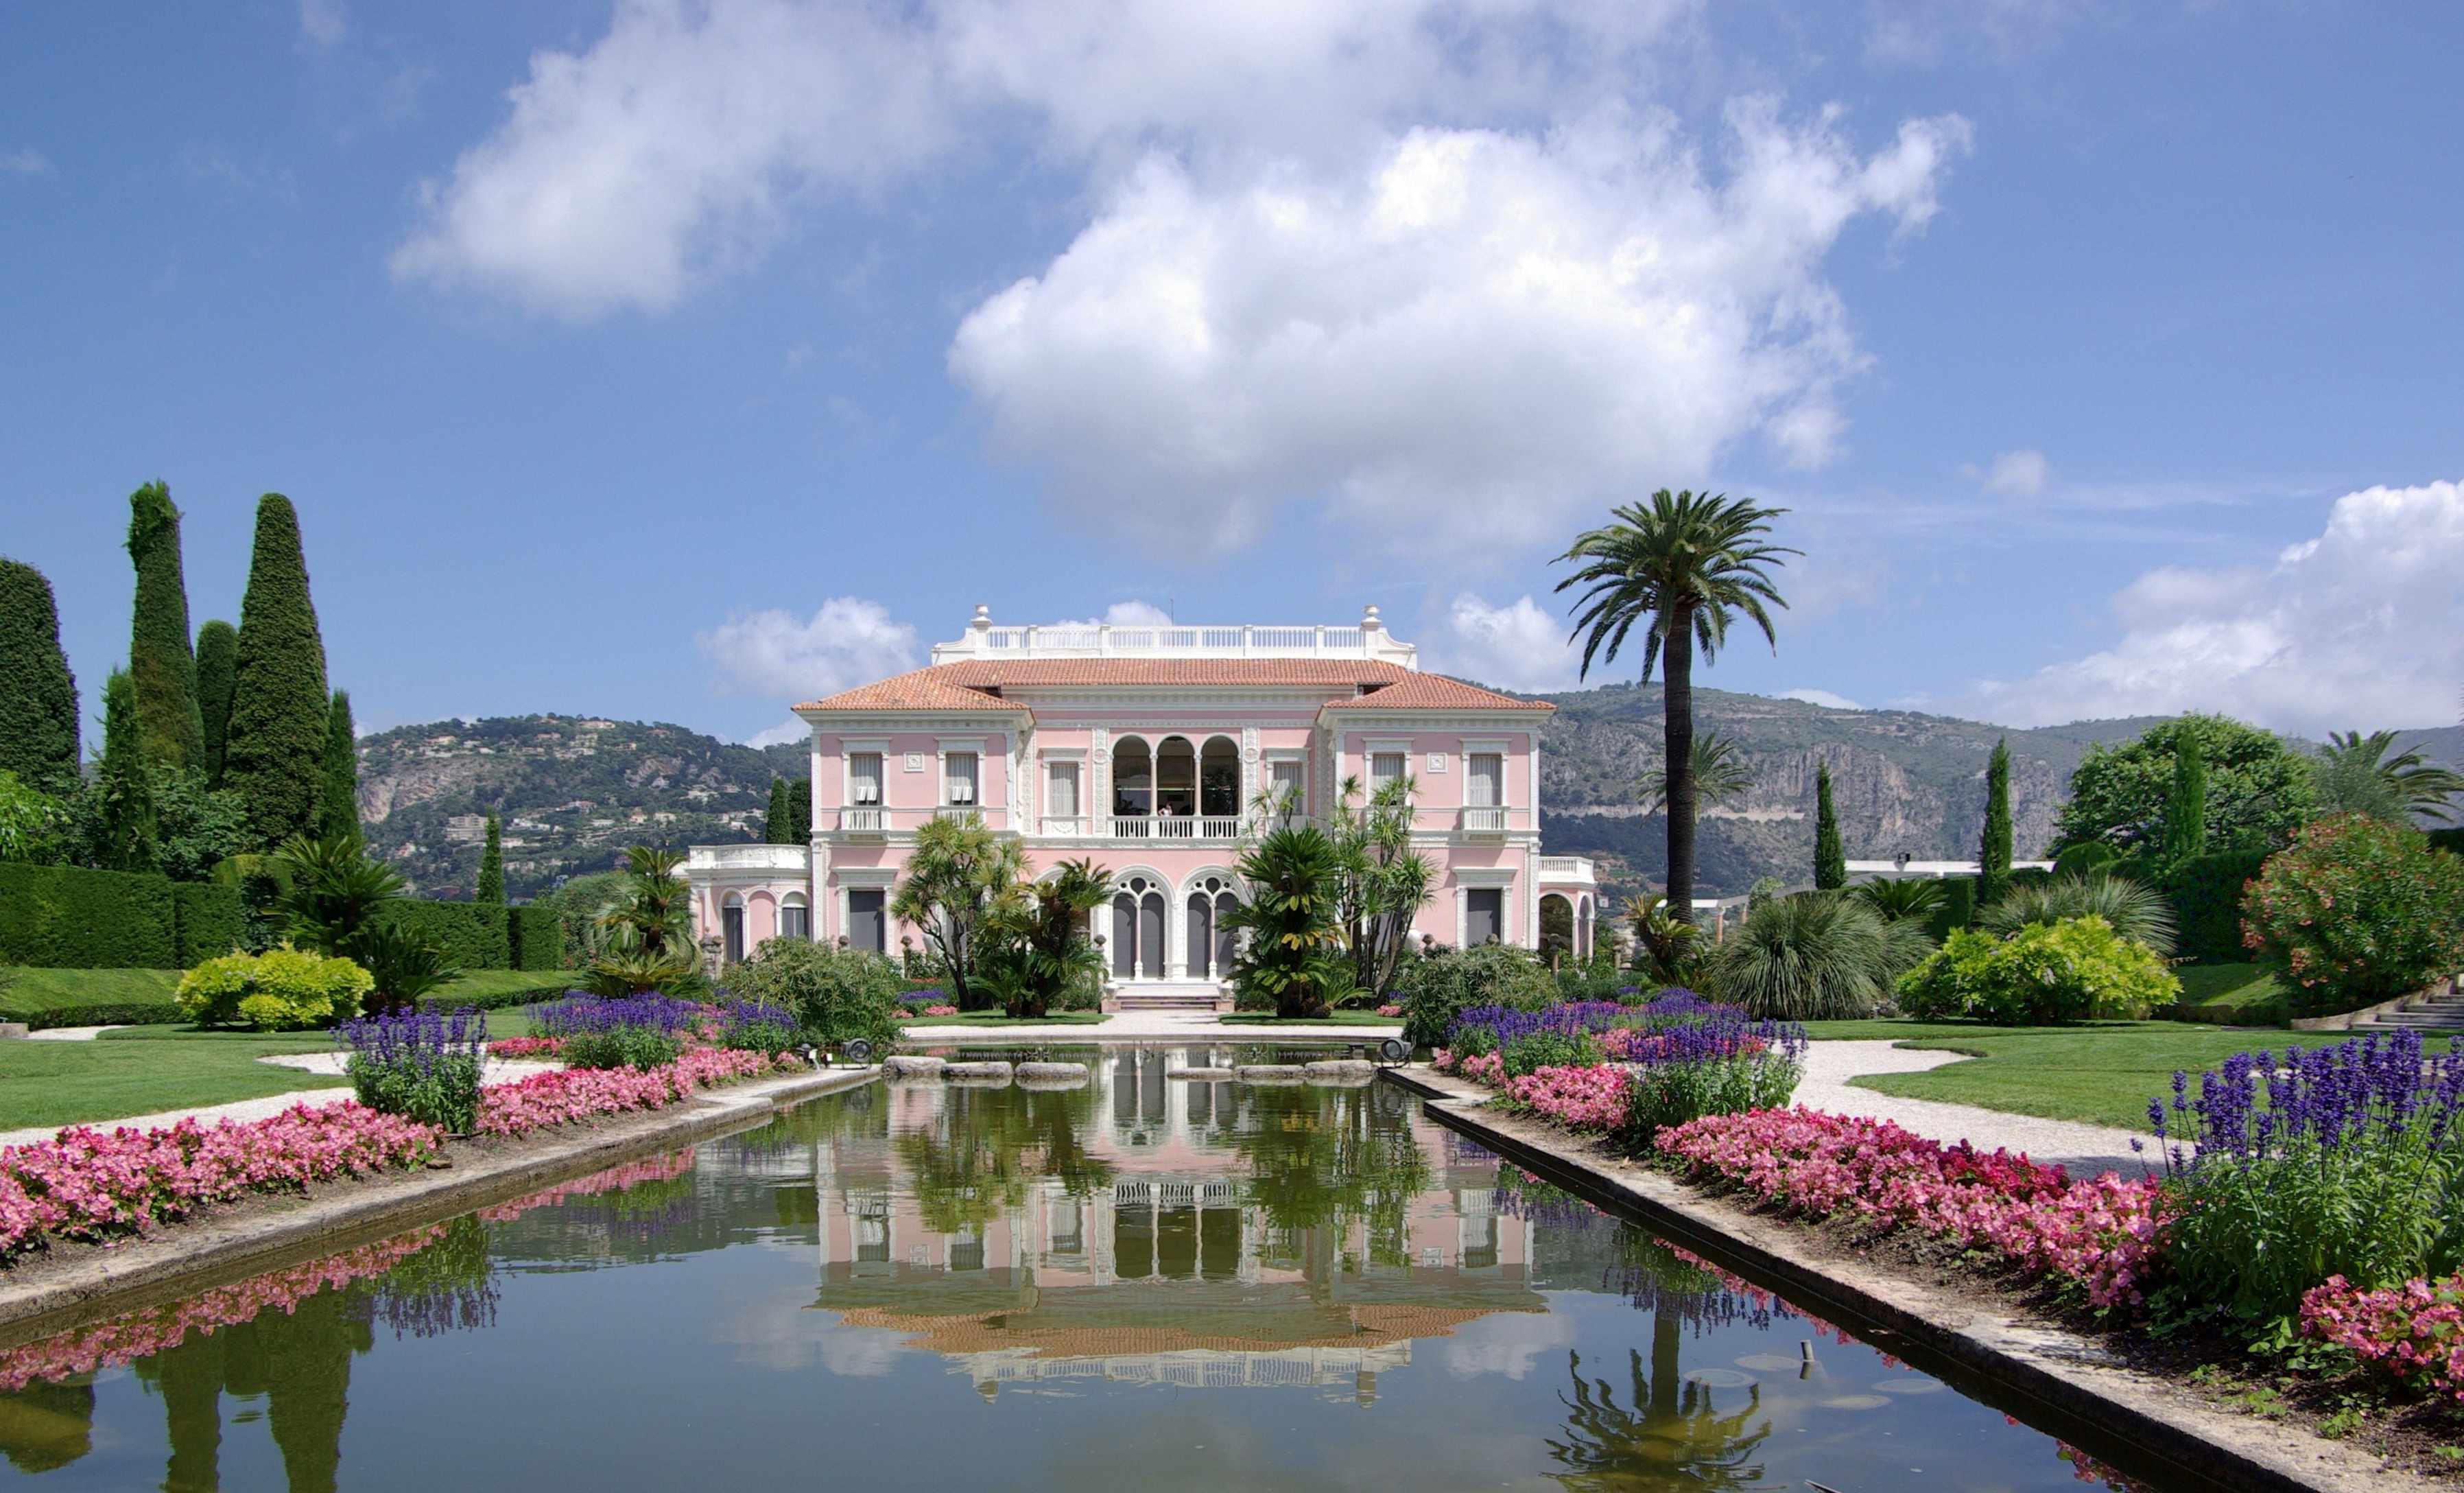 Villa Ephrussi de Rothschild Wikiwand